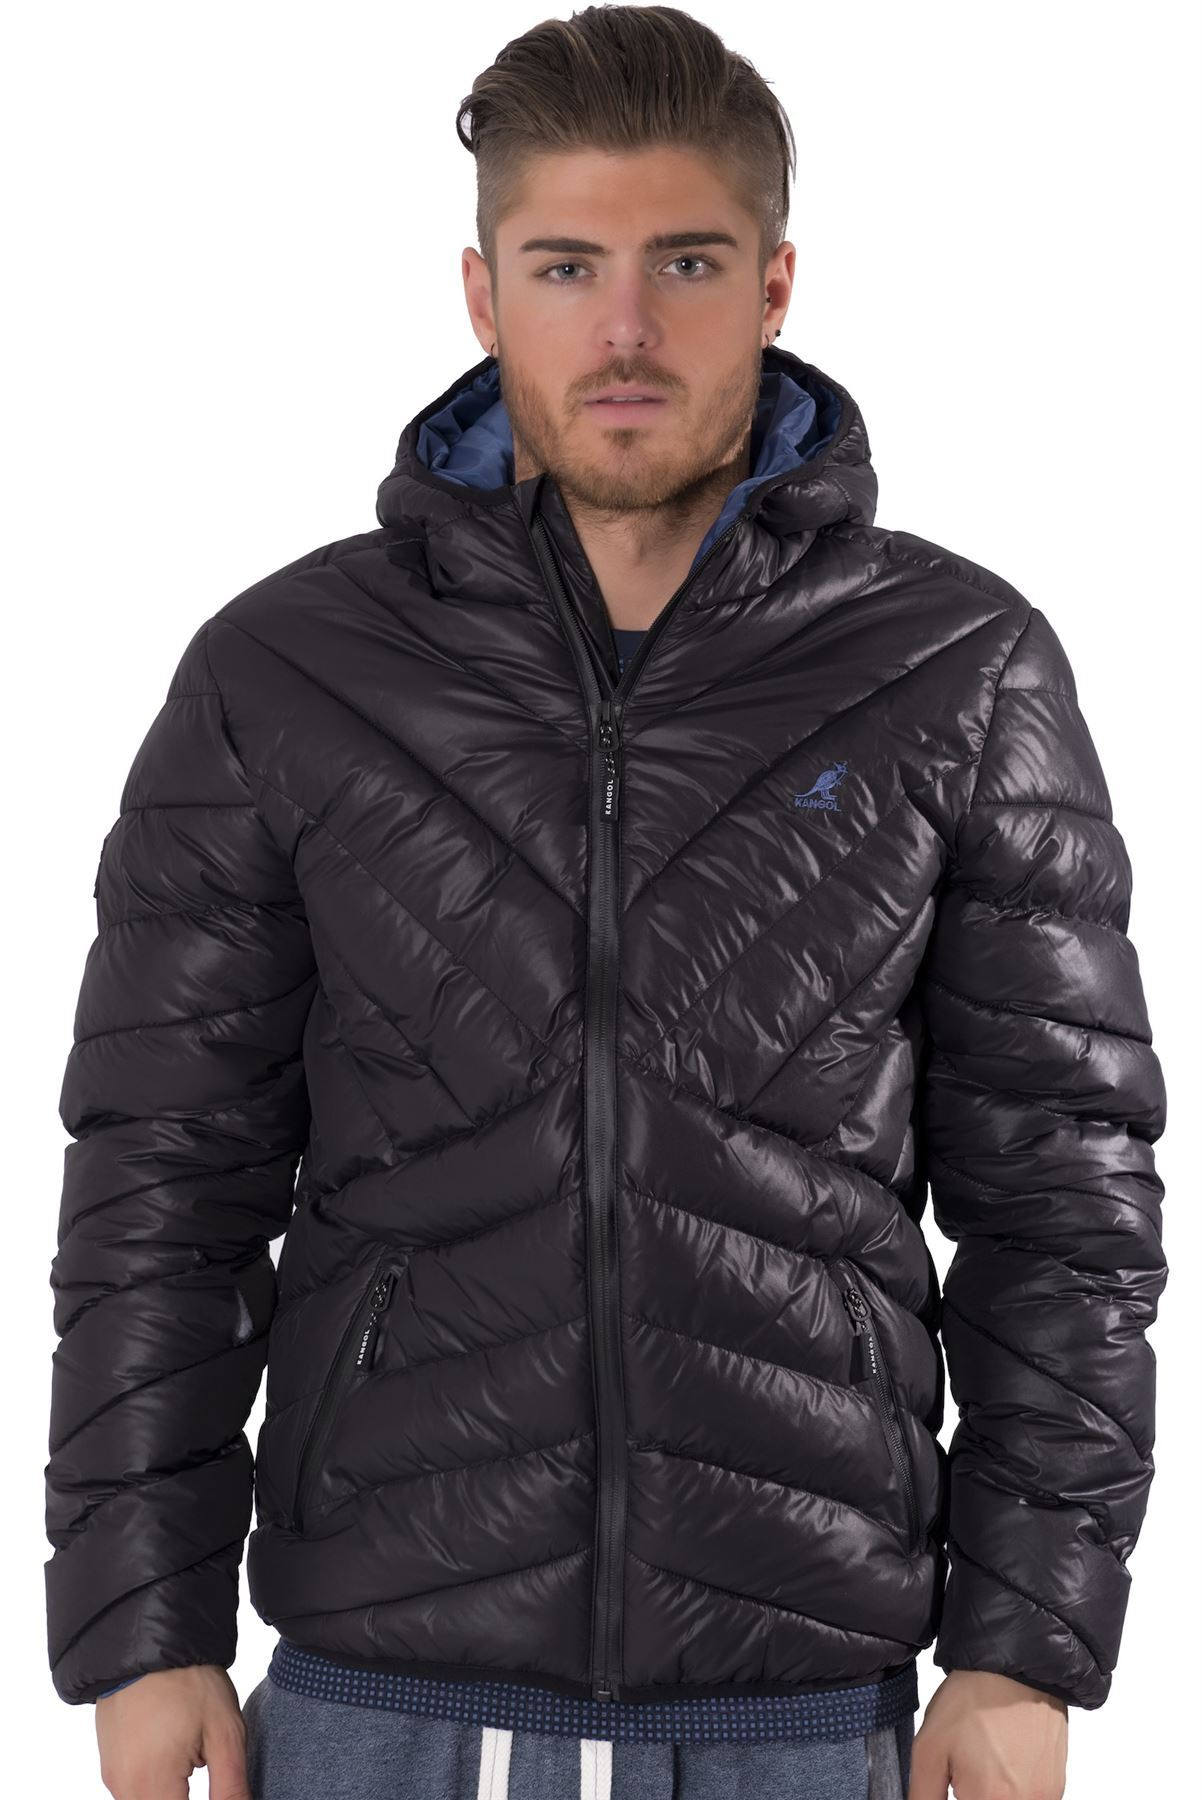 Kangol Mens Quilted Puffer Zip Up Jacket Streetwear Hooded